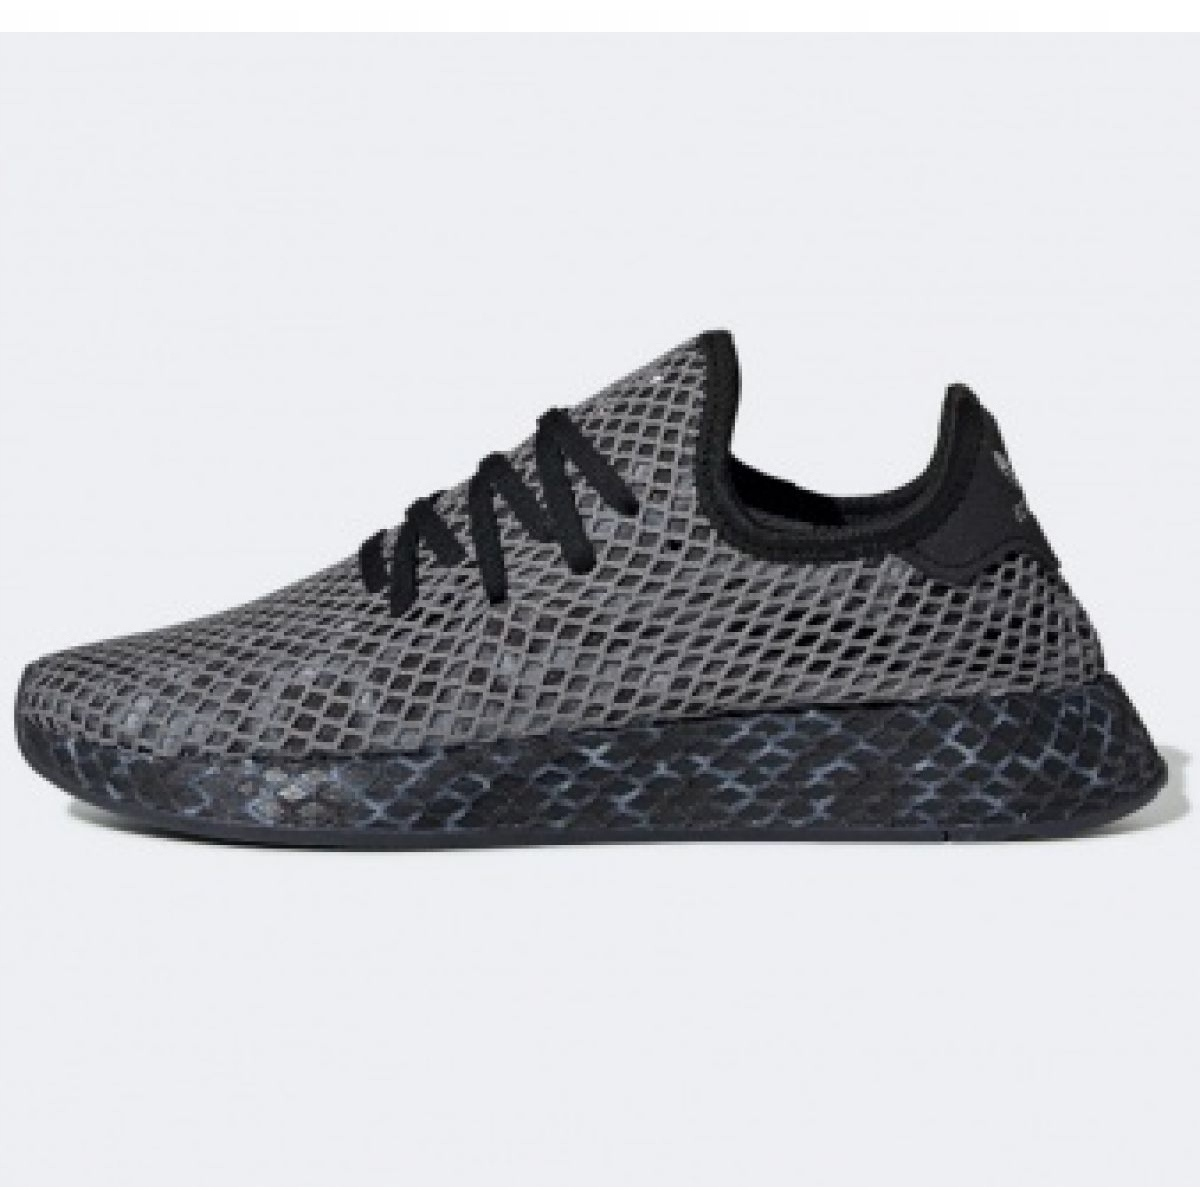 Details about Adidas Originals Deerupt Runner M EE5657 shoes